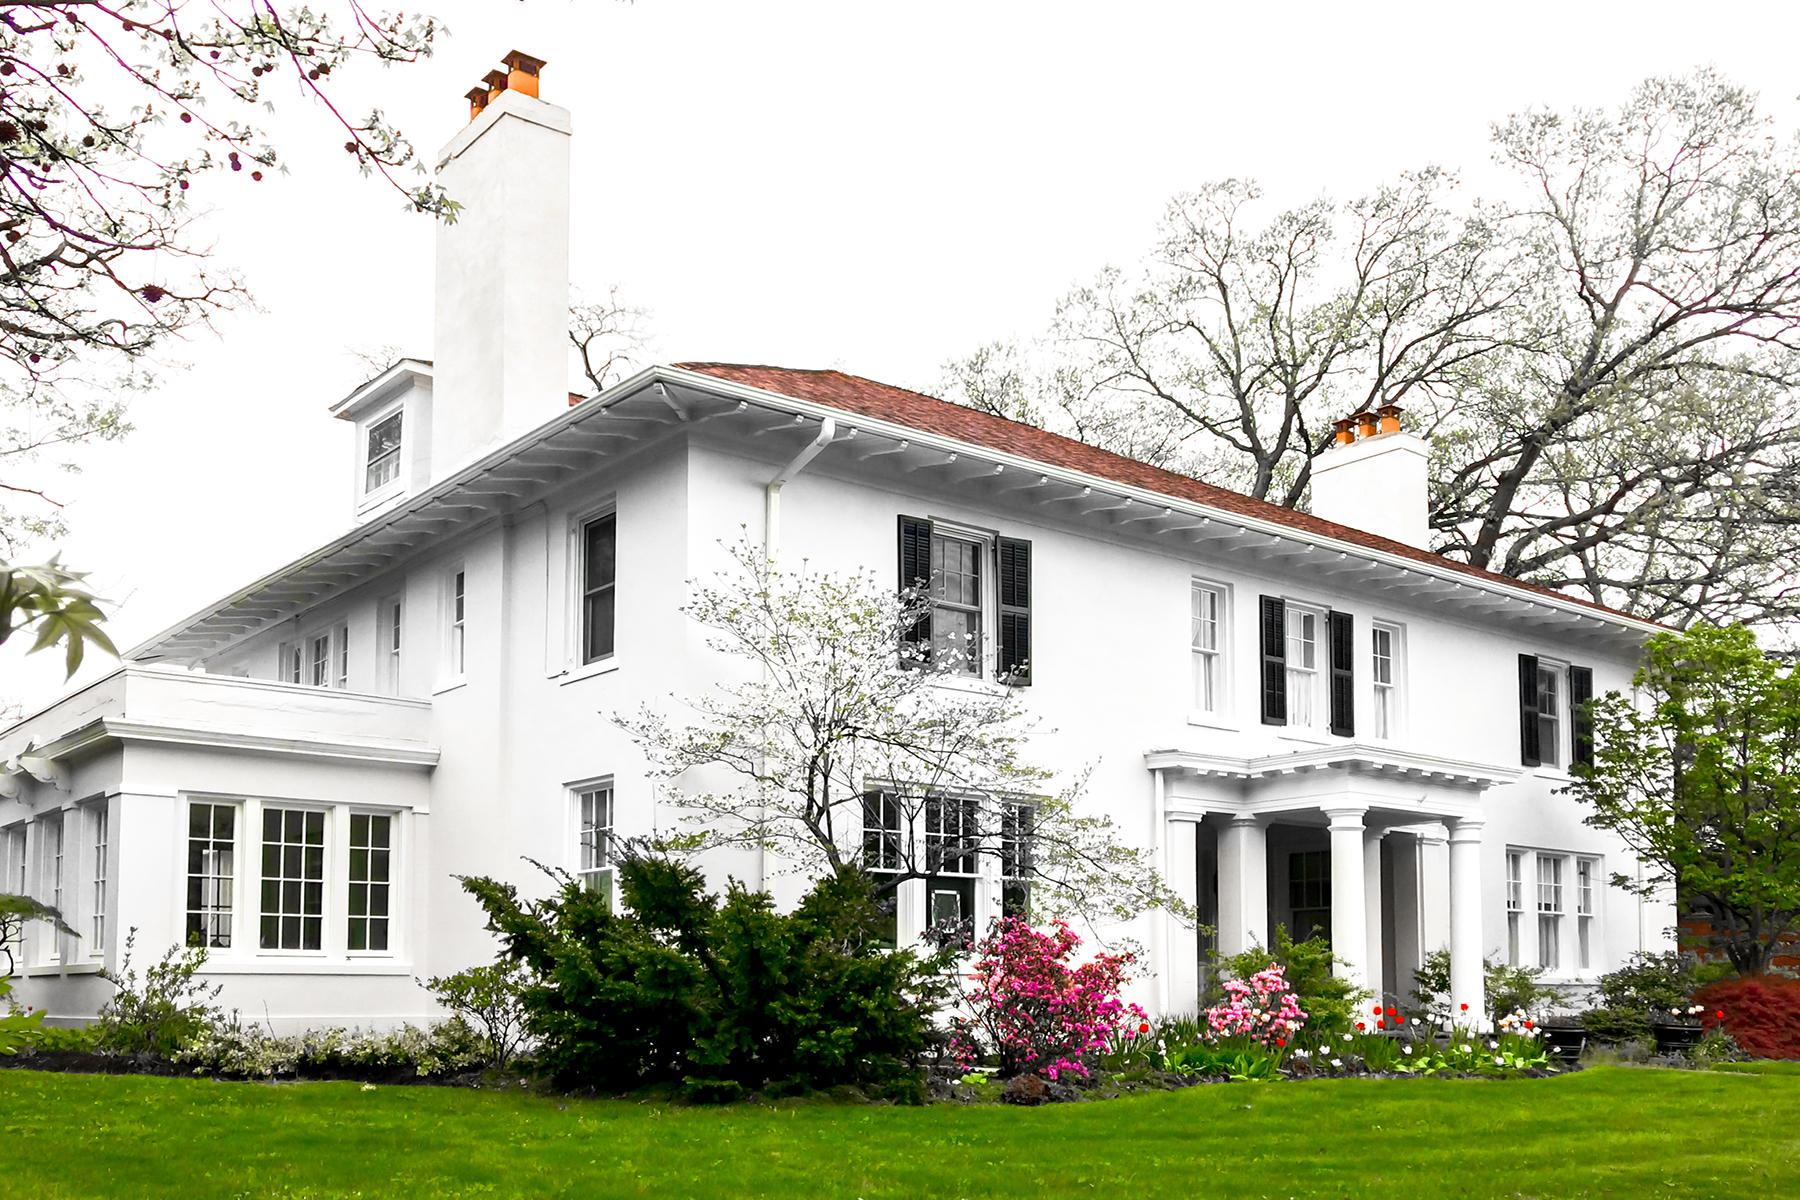 Single Family Homes for Sale at Detroit, MI 1731 Seminole Detroit, Michigan 48214 United States